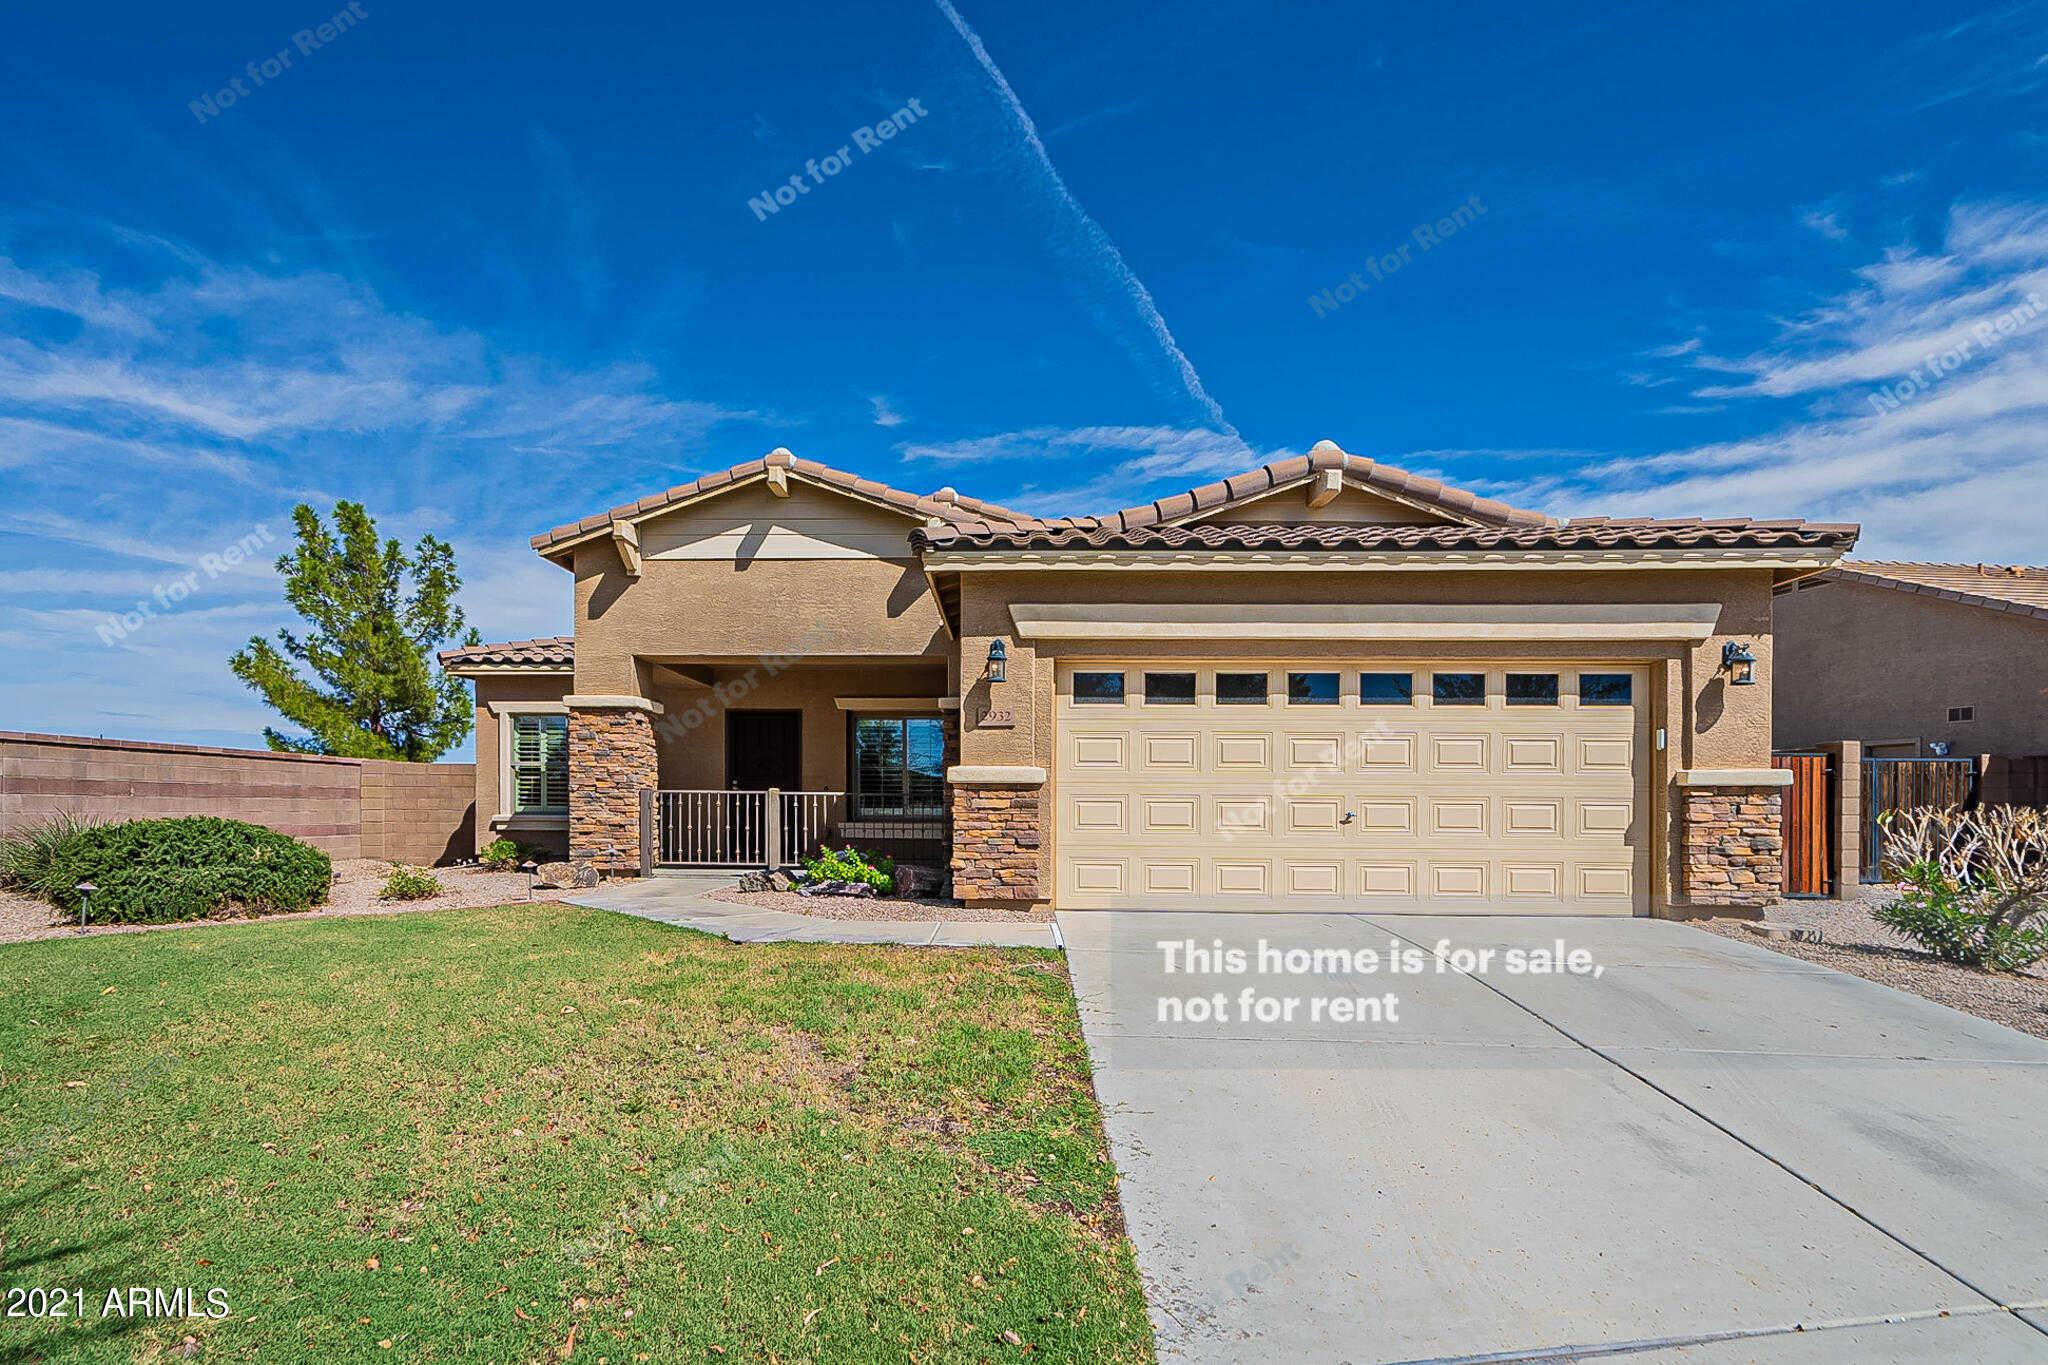 $612,000 - 4Br/2Ba - Home for Sale in Shamrock Estates Phase 2b, Gilbert